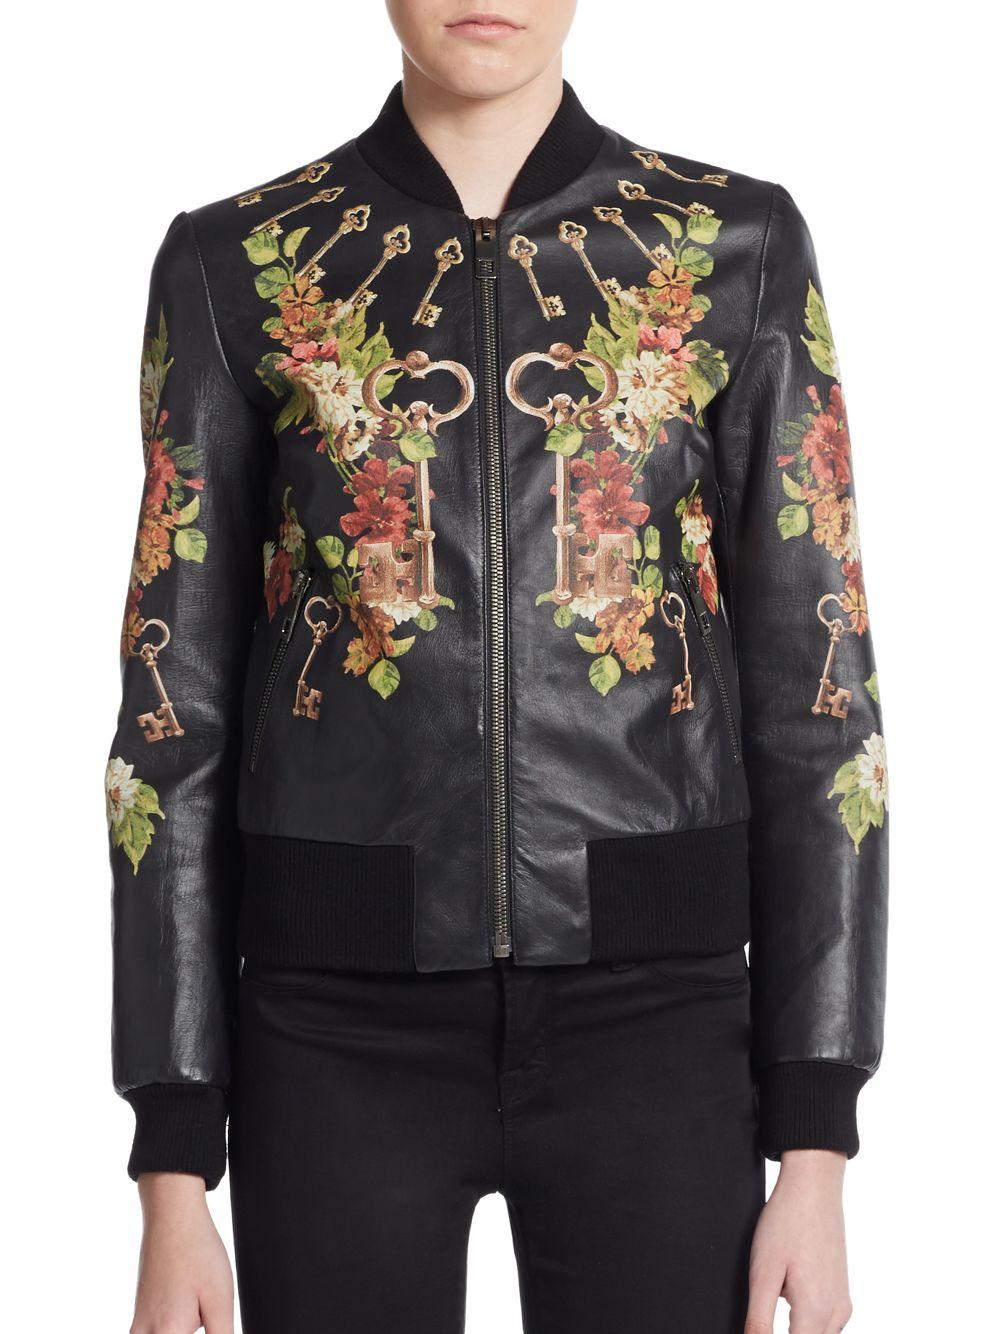 5fe548b59093 dolce-gabbana-black-multi-key-floral-print-leather-bomber-jacket-black-product-1-836953382-normal.jpeg